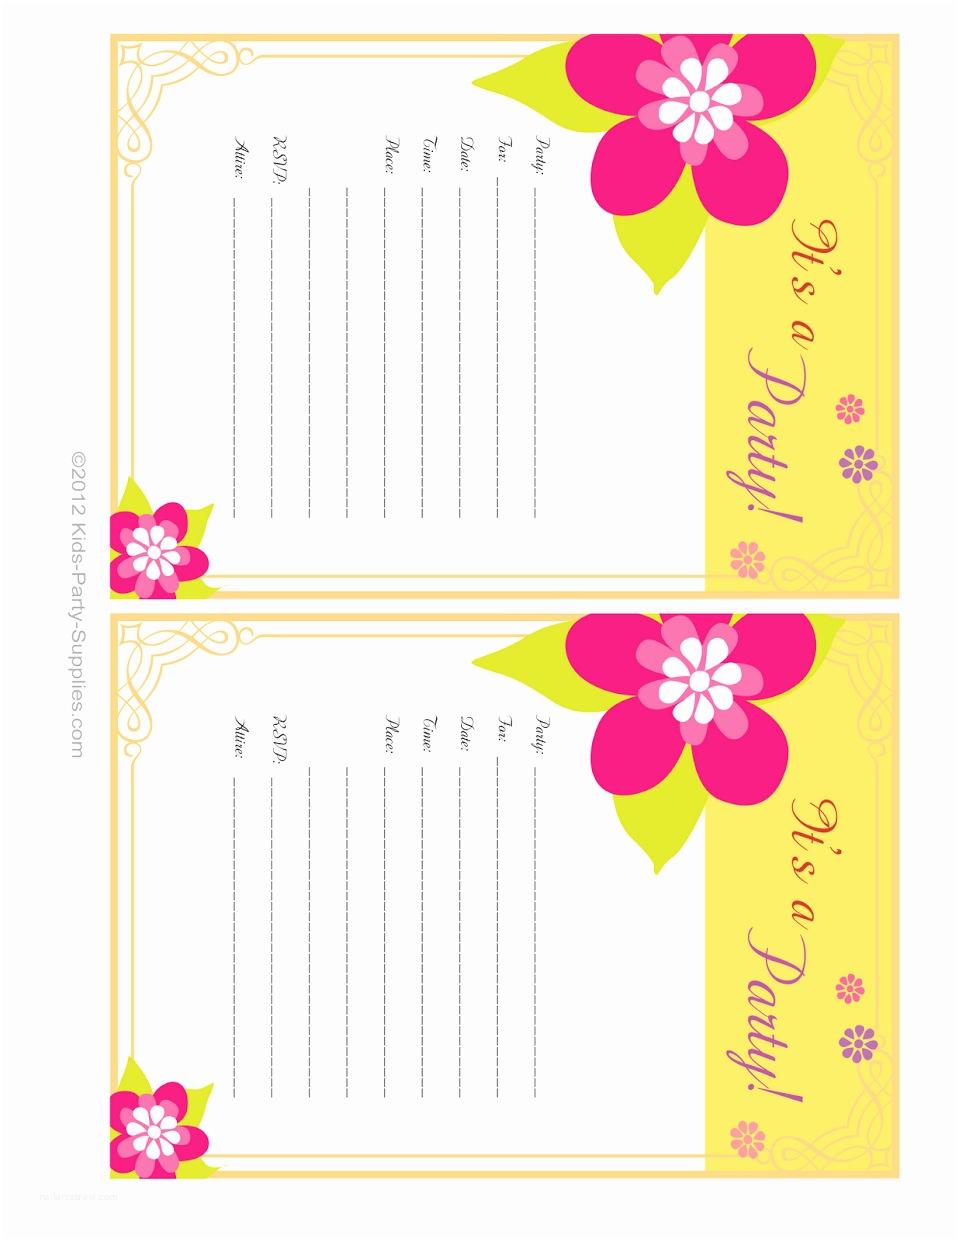 Design Party Invitations Free Printable Birthday Party Invitations